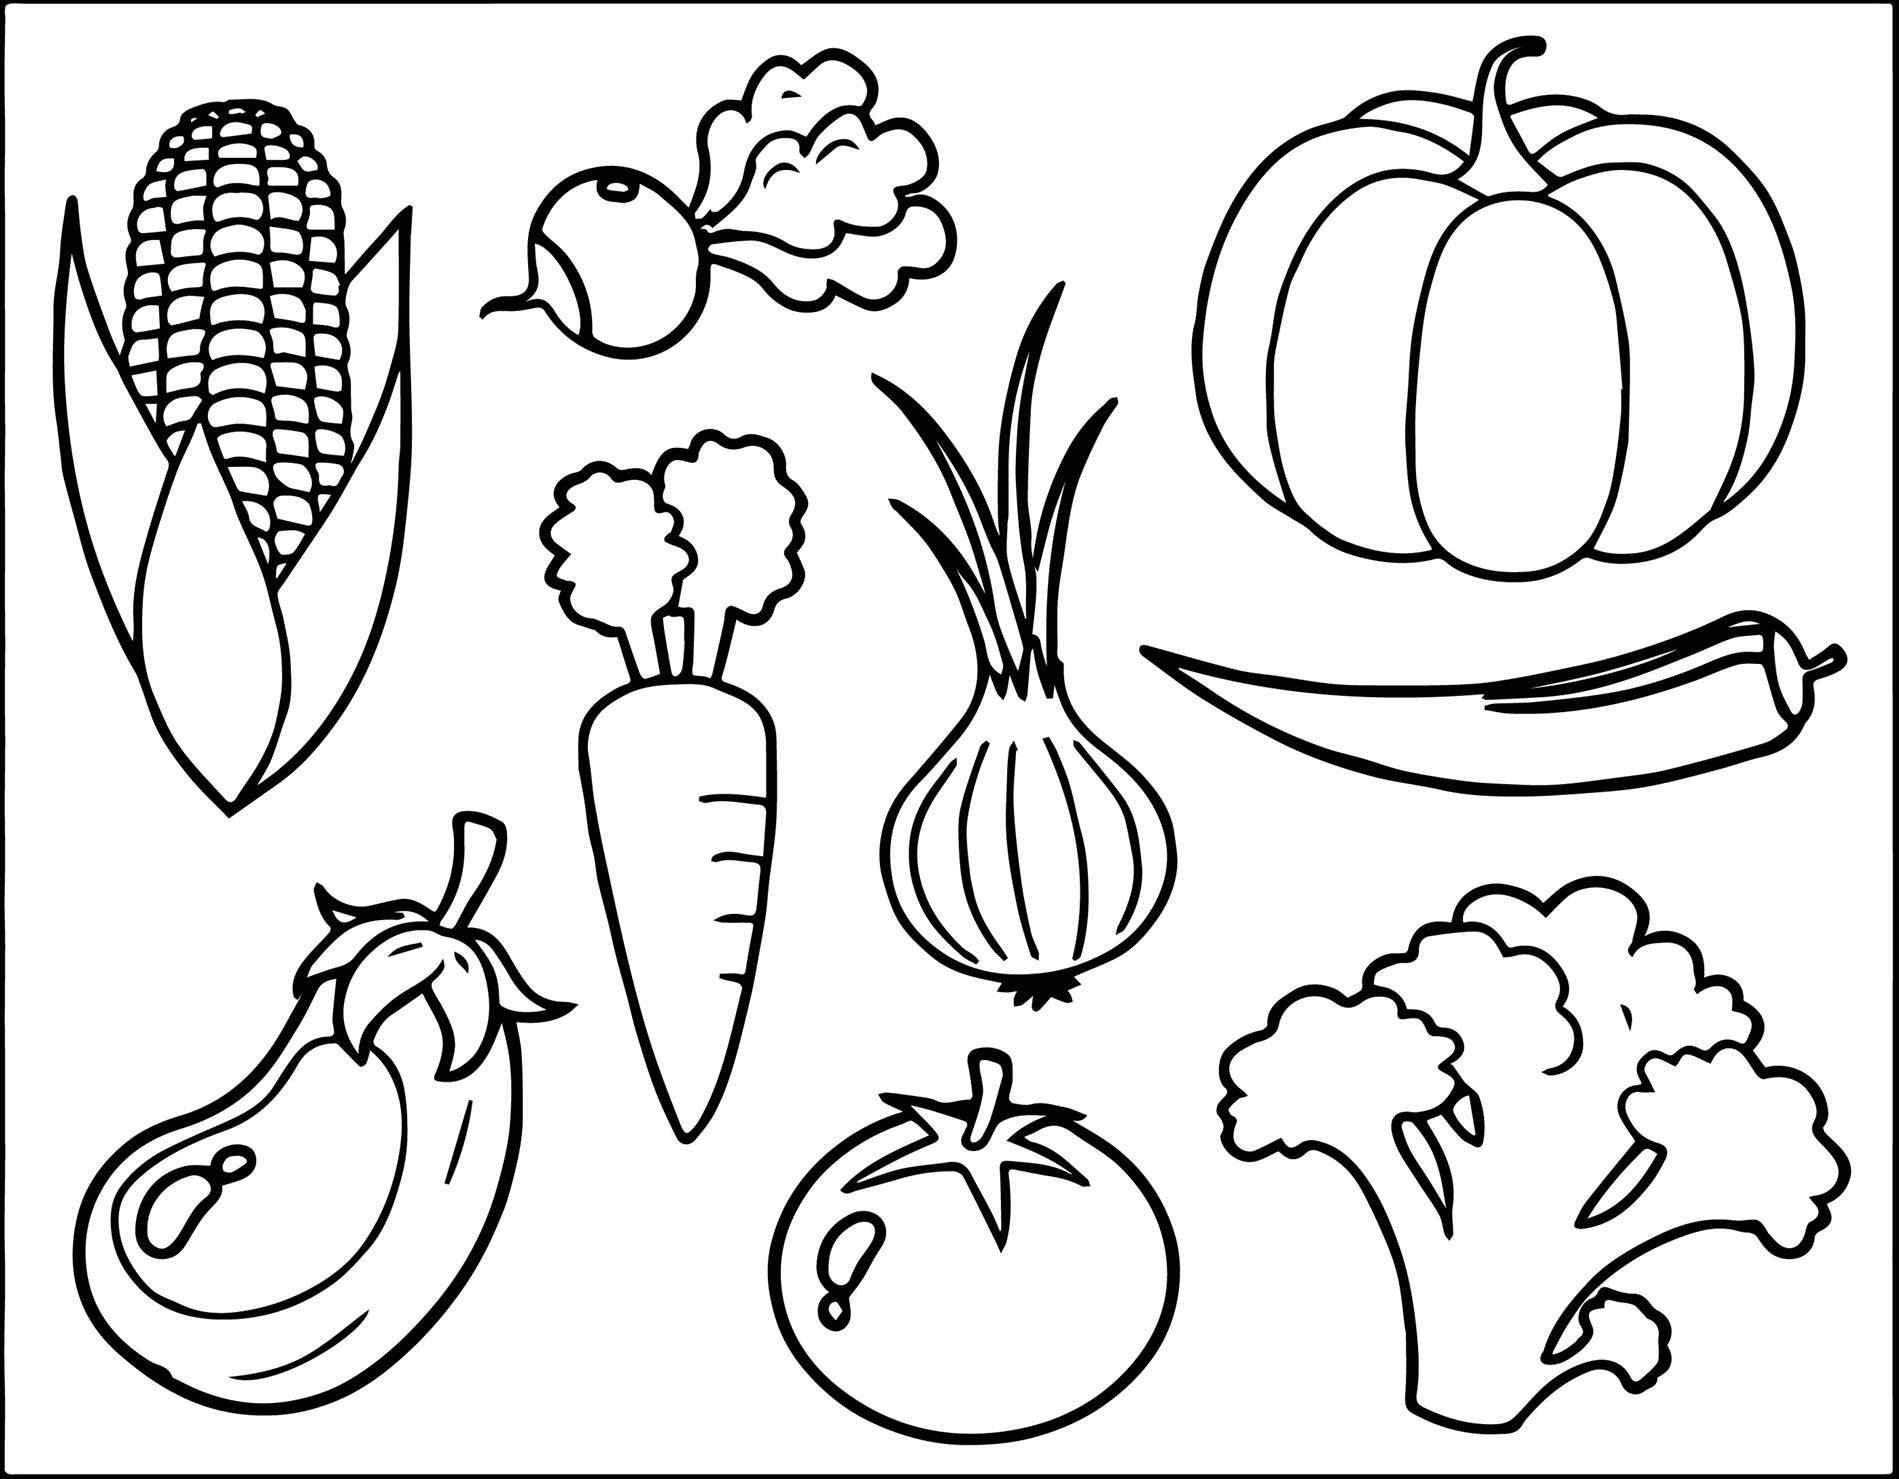 - Pretty Photo Of Healthy Food Coloring Pages (con Imágenes